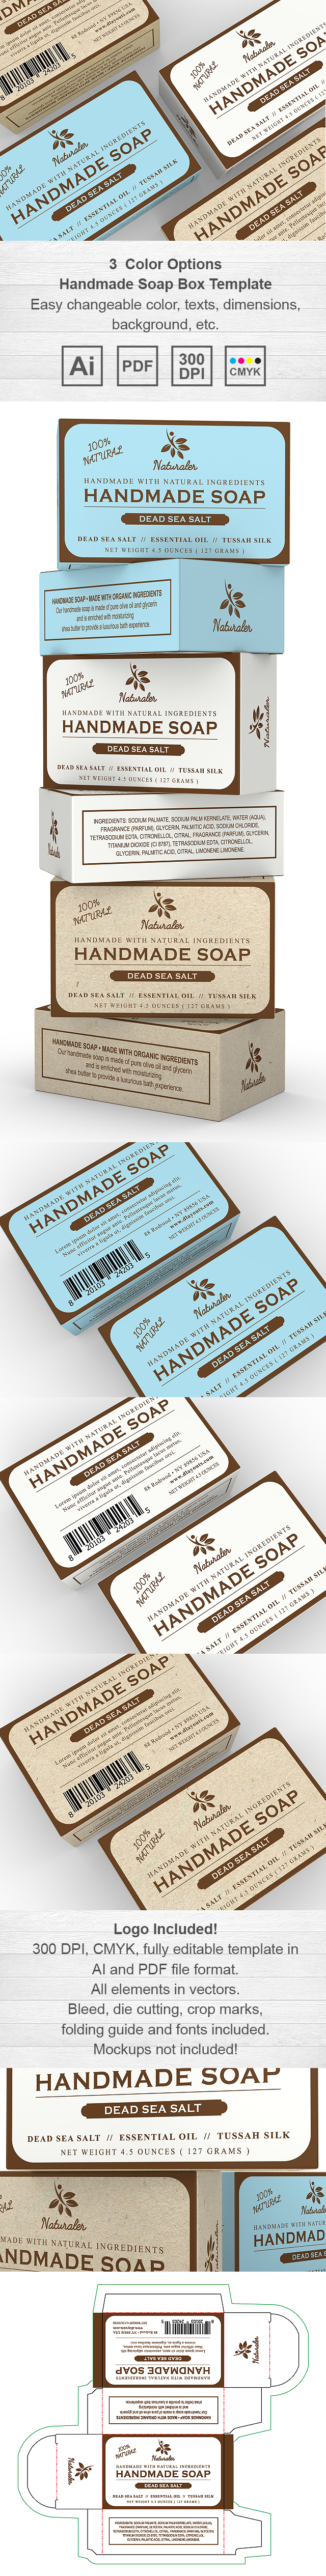 Handmade Soap Box Packaging Template